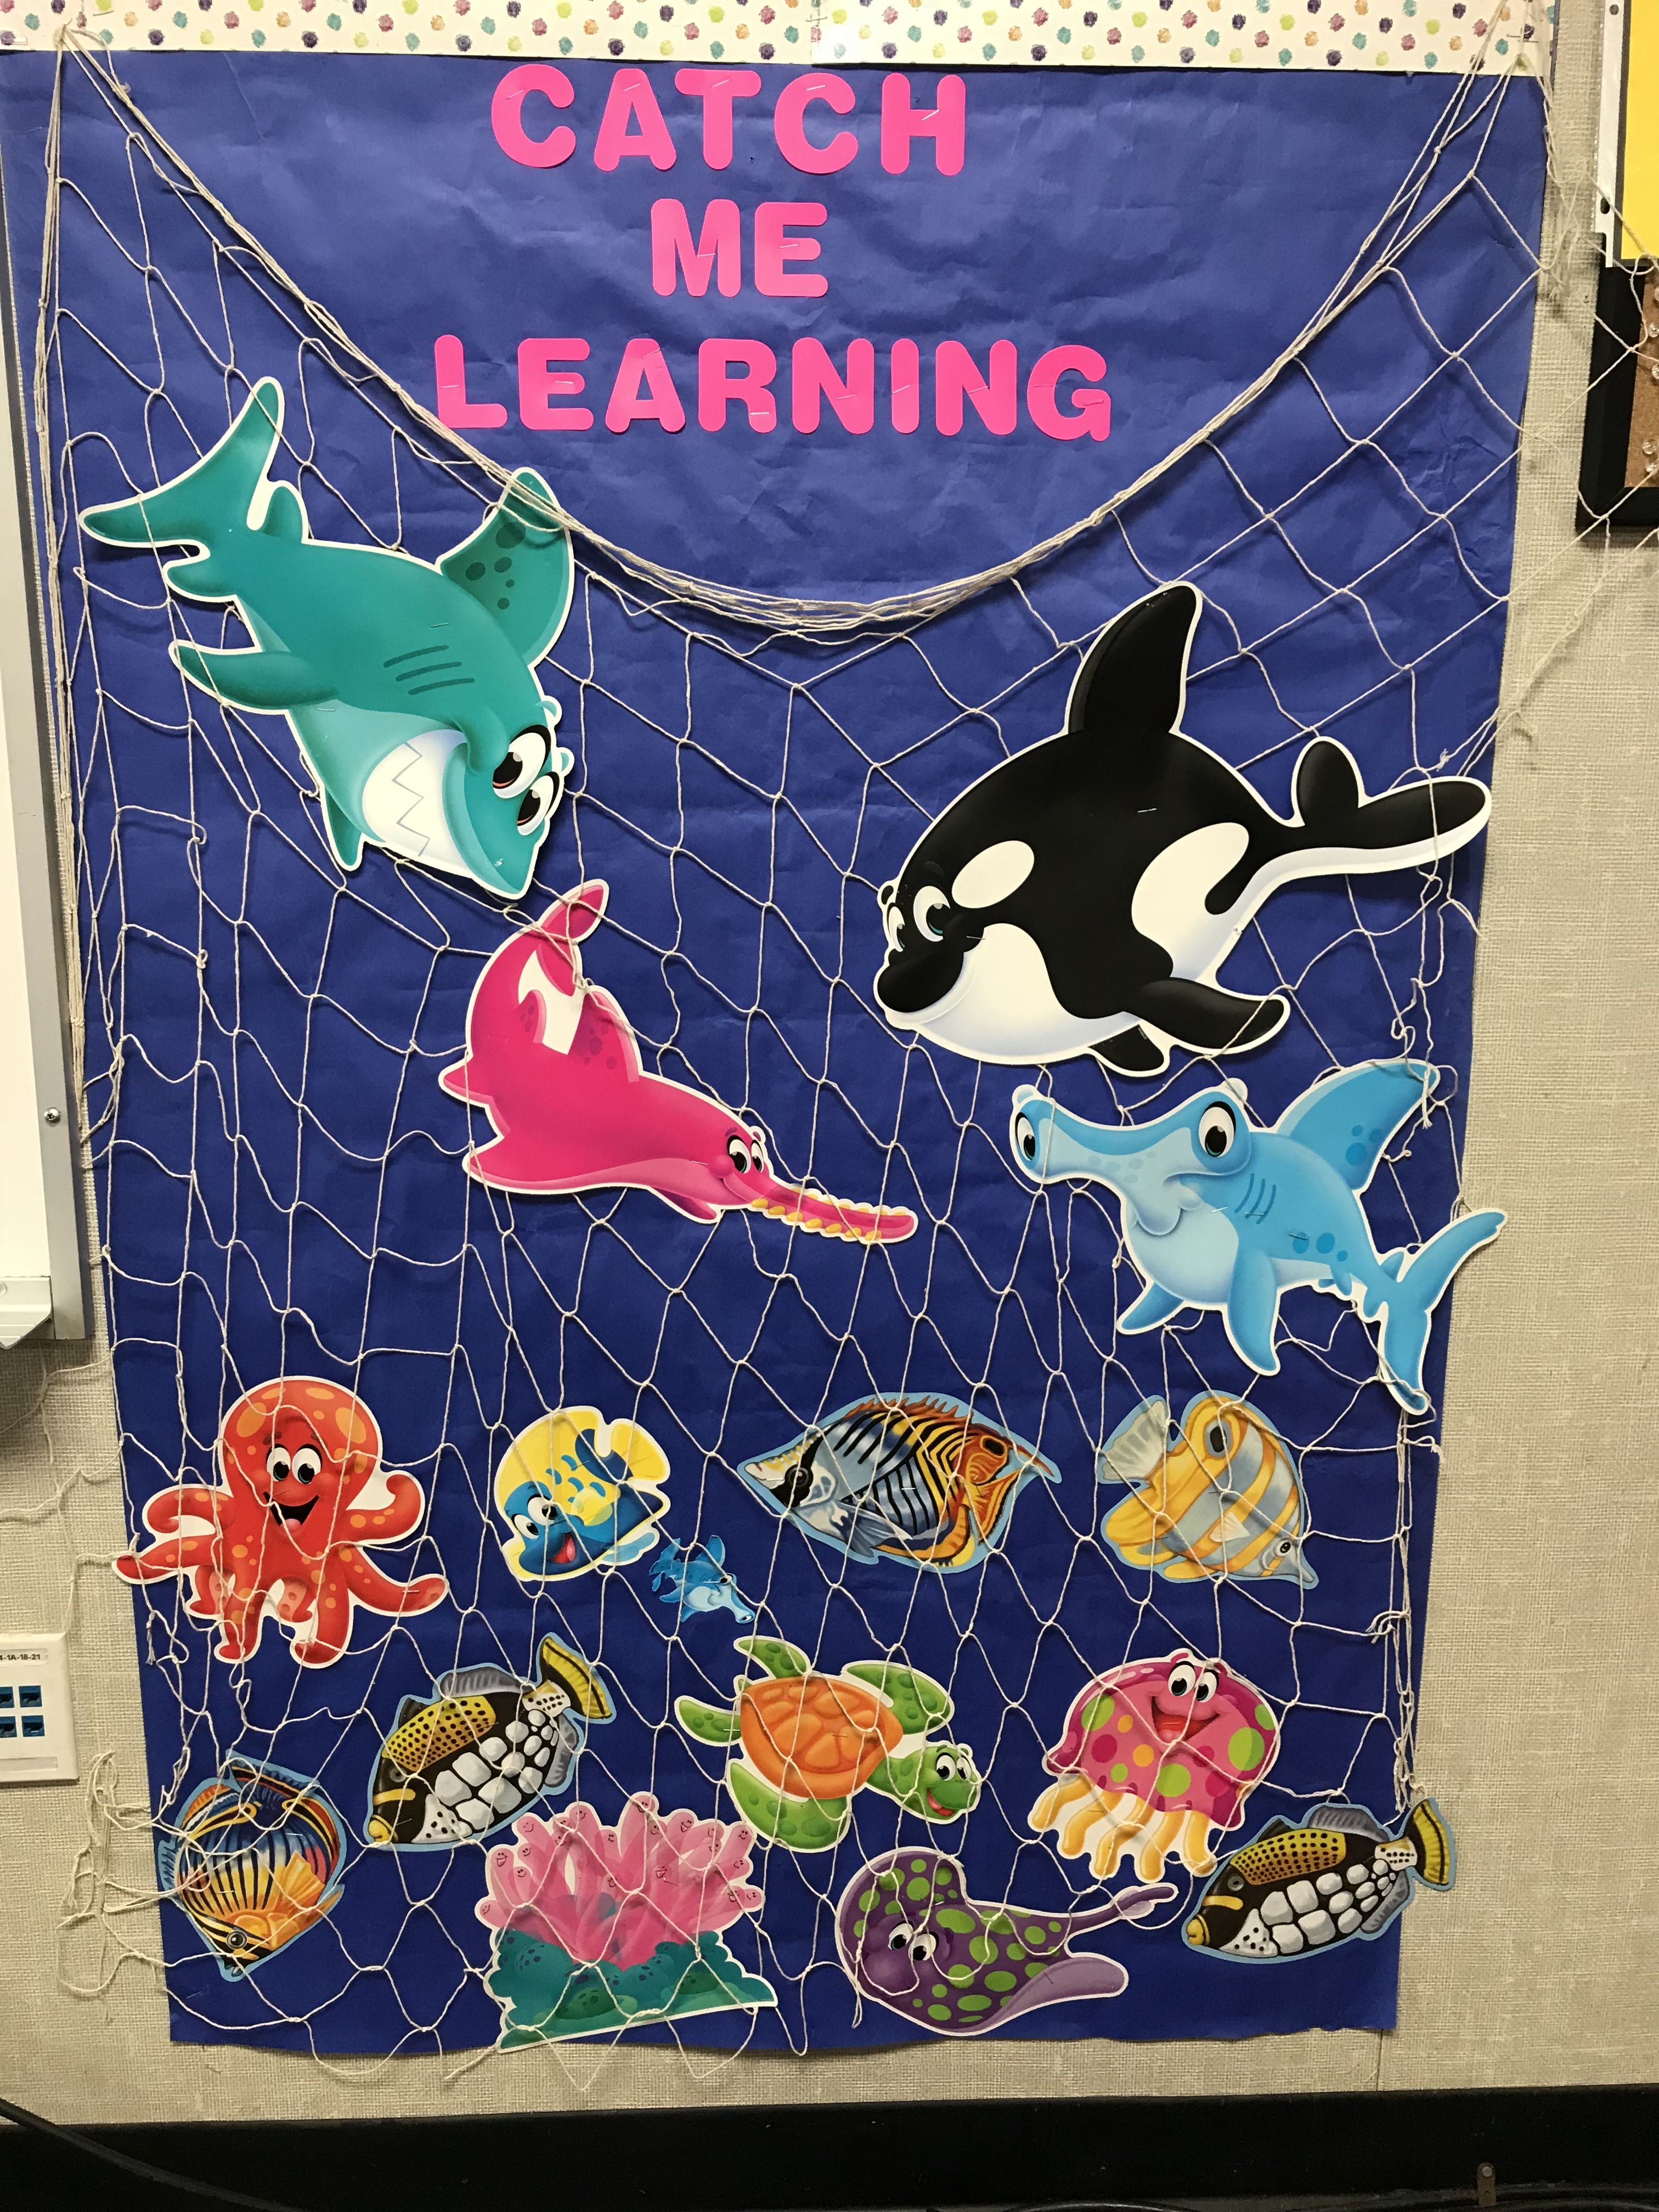 Under The Sea Theme Catch Me Learning Preschool Board